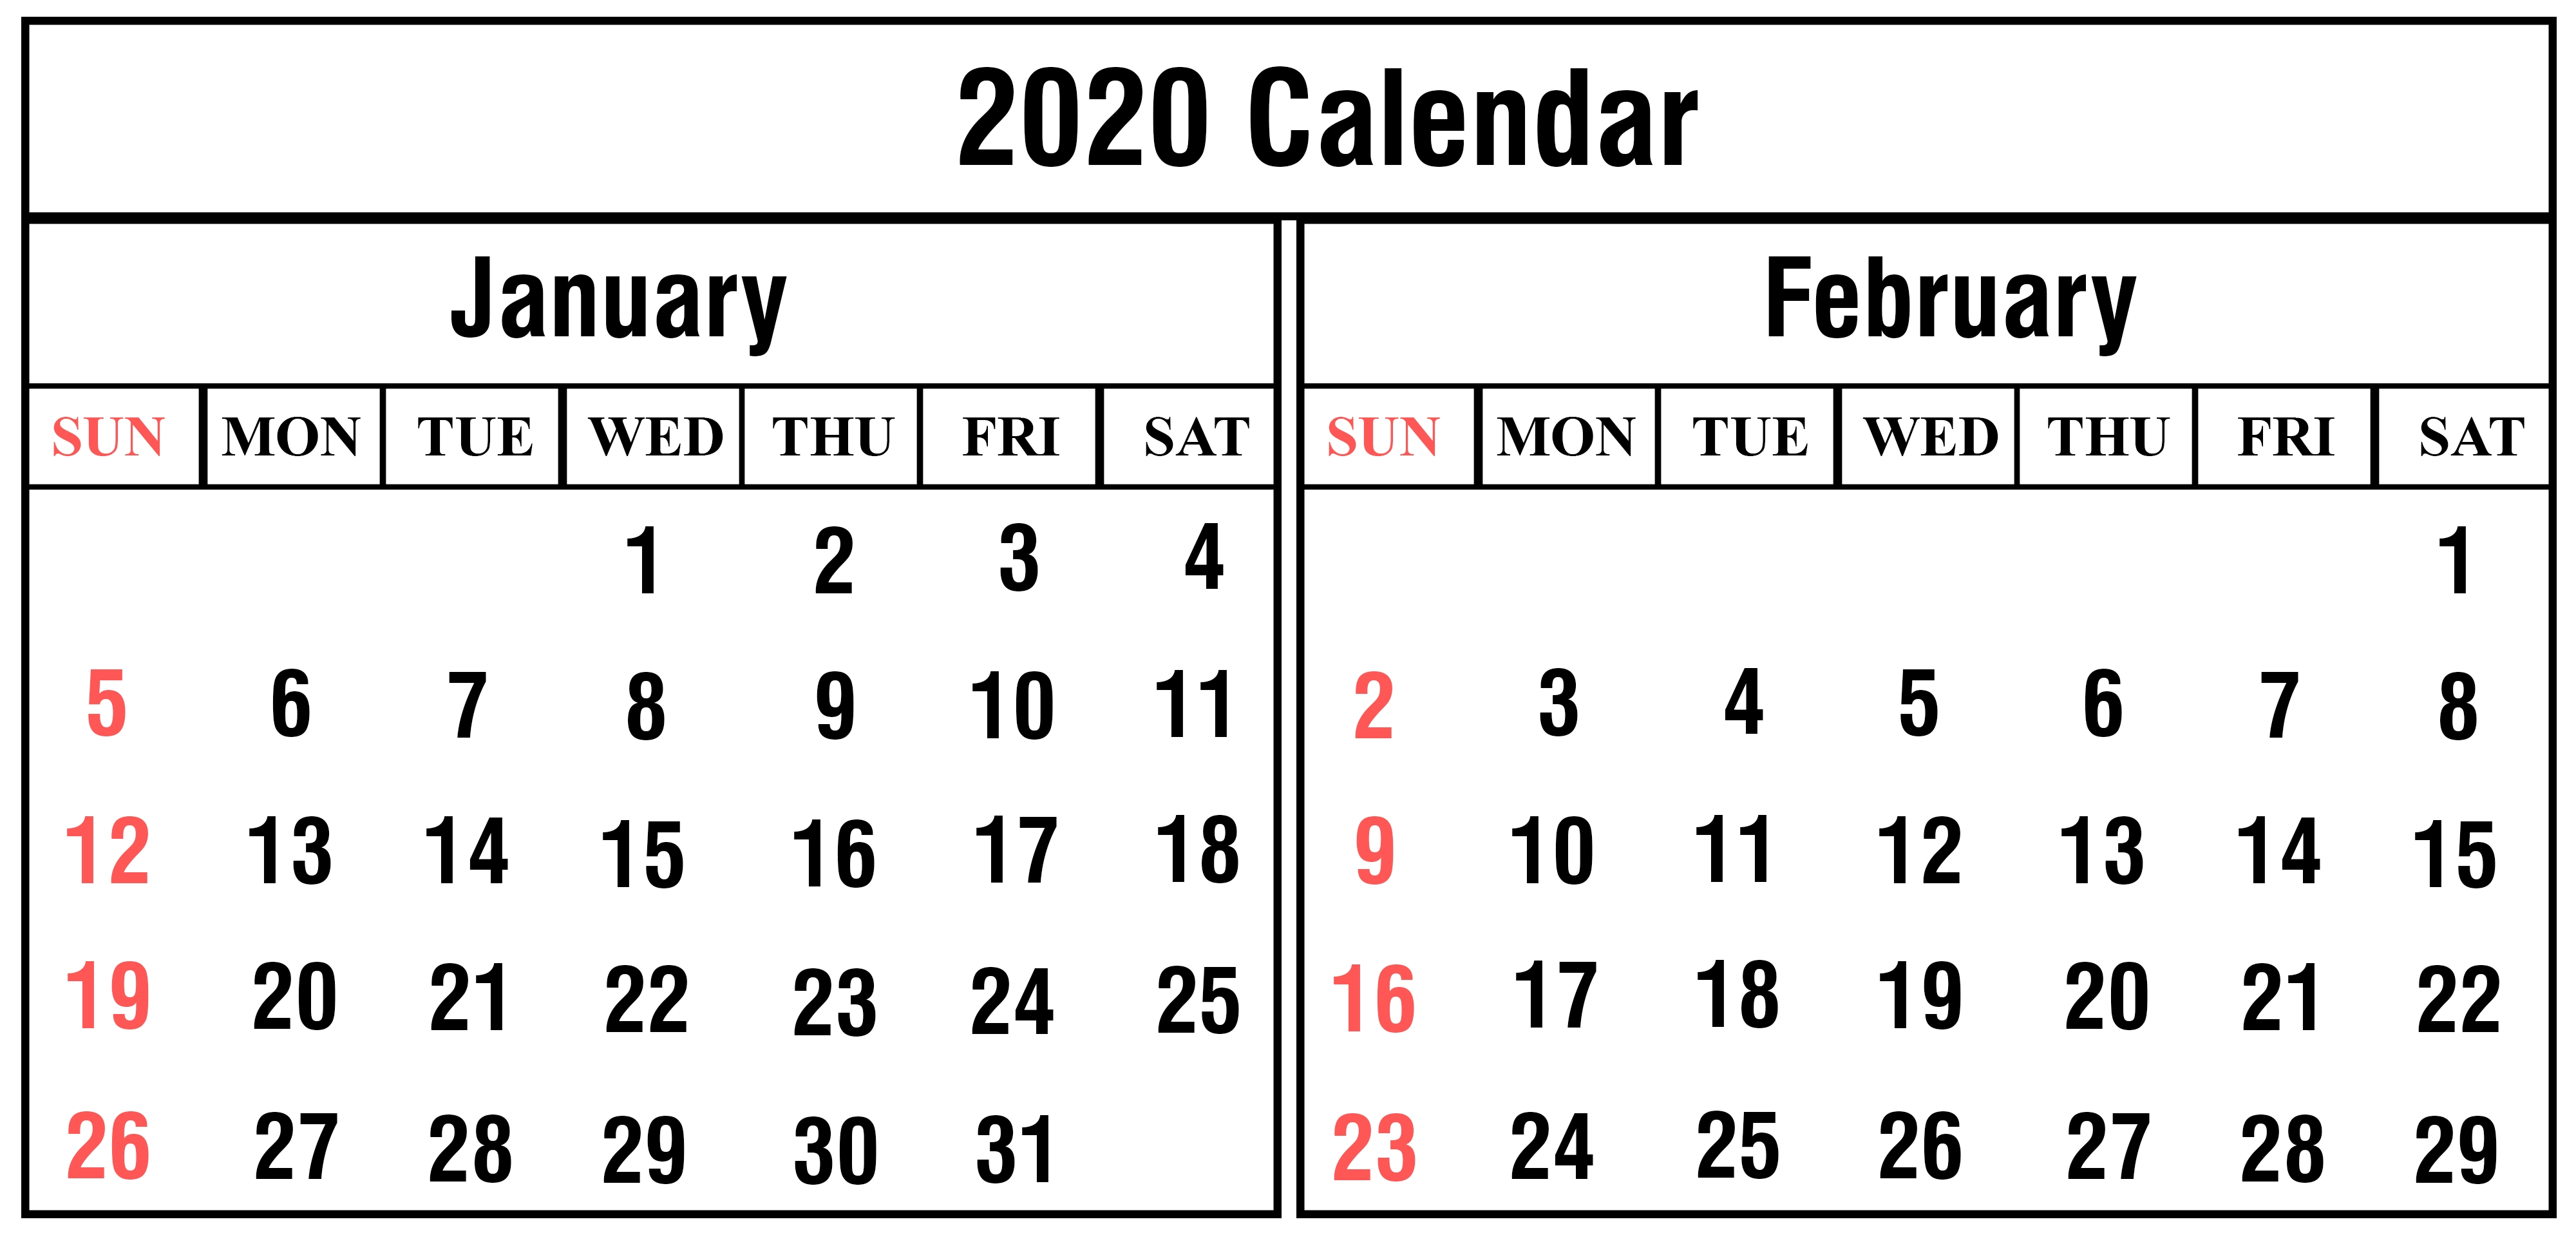 Free January And February 2020 Calendar Templates-2020 Calendar January And February